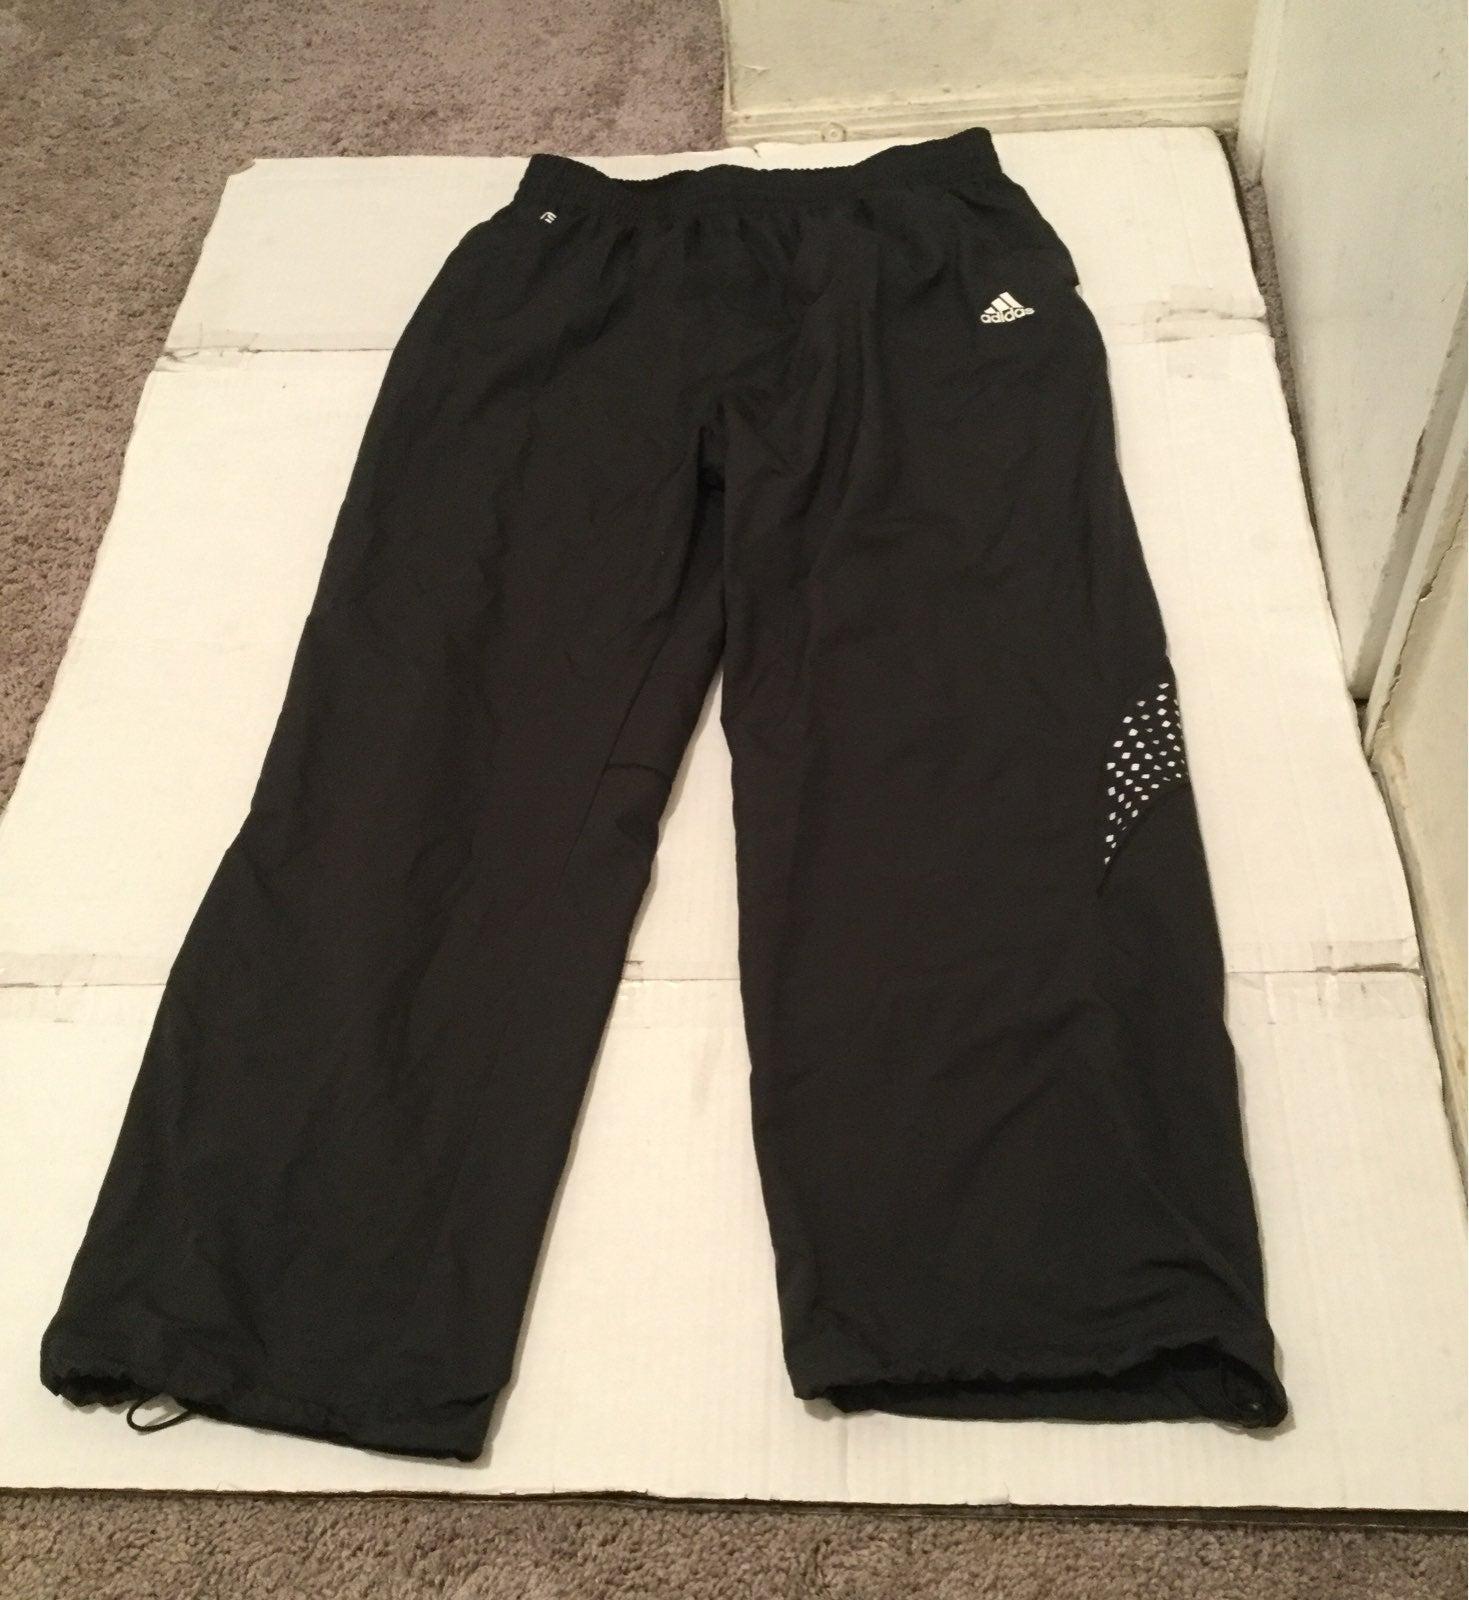 MENS ADIDAS SWEAT PANTS SIZE XL